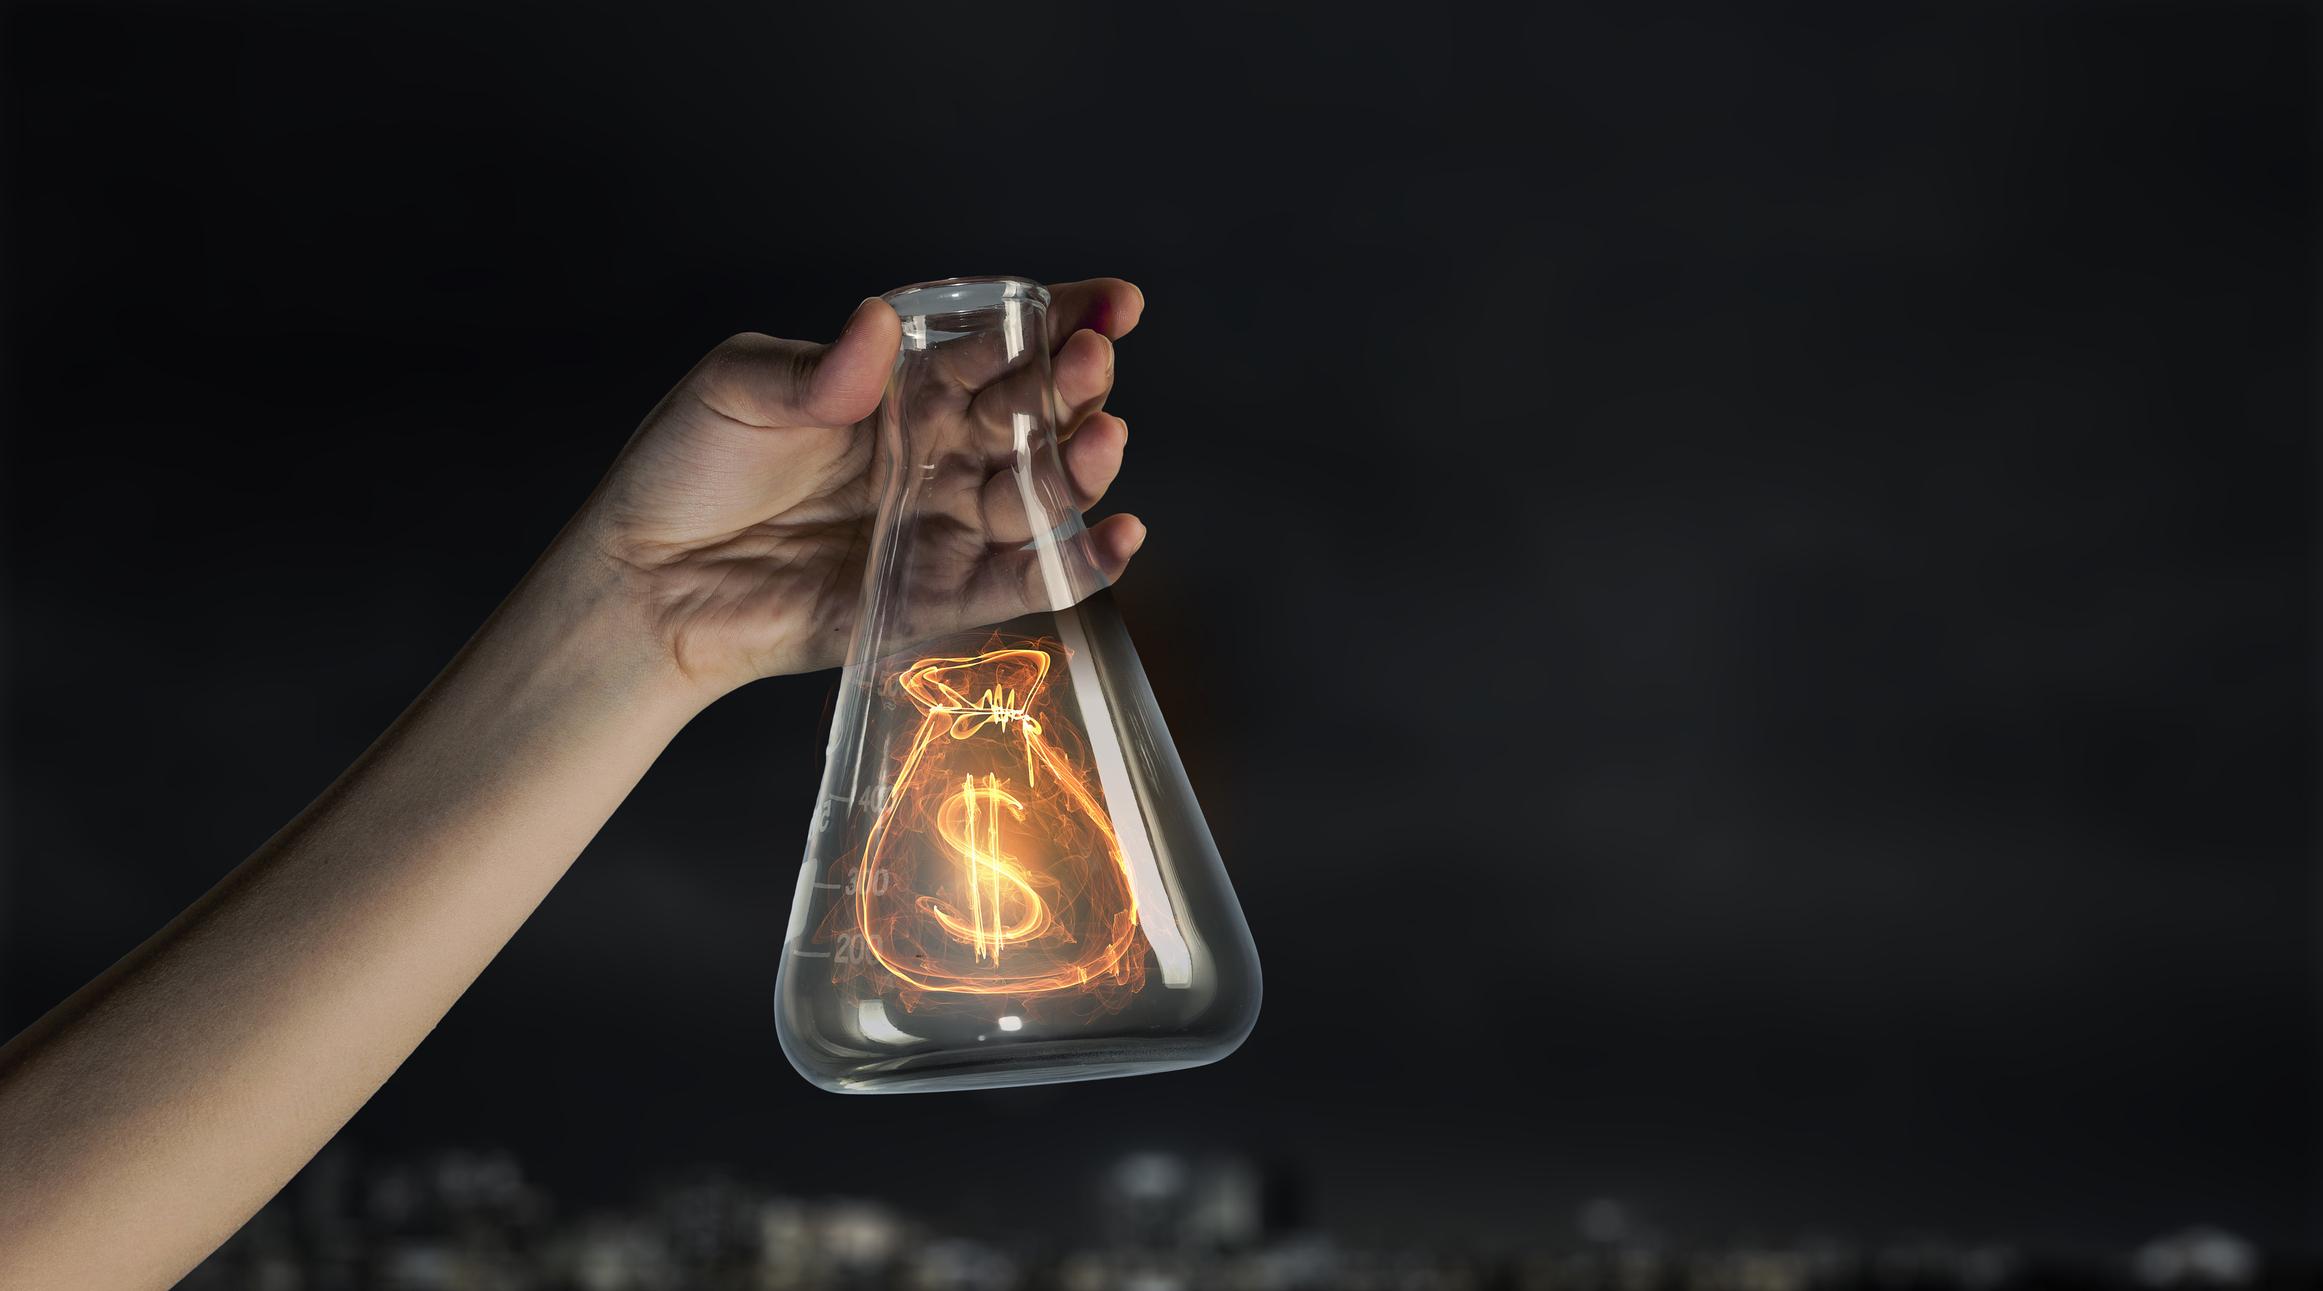 Lit up dollar sign inside of an erlenmeyer flask.